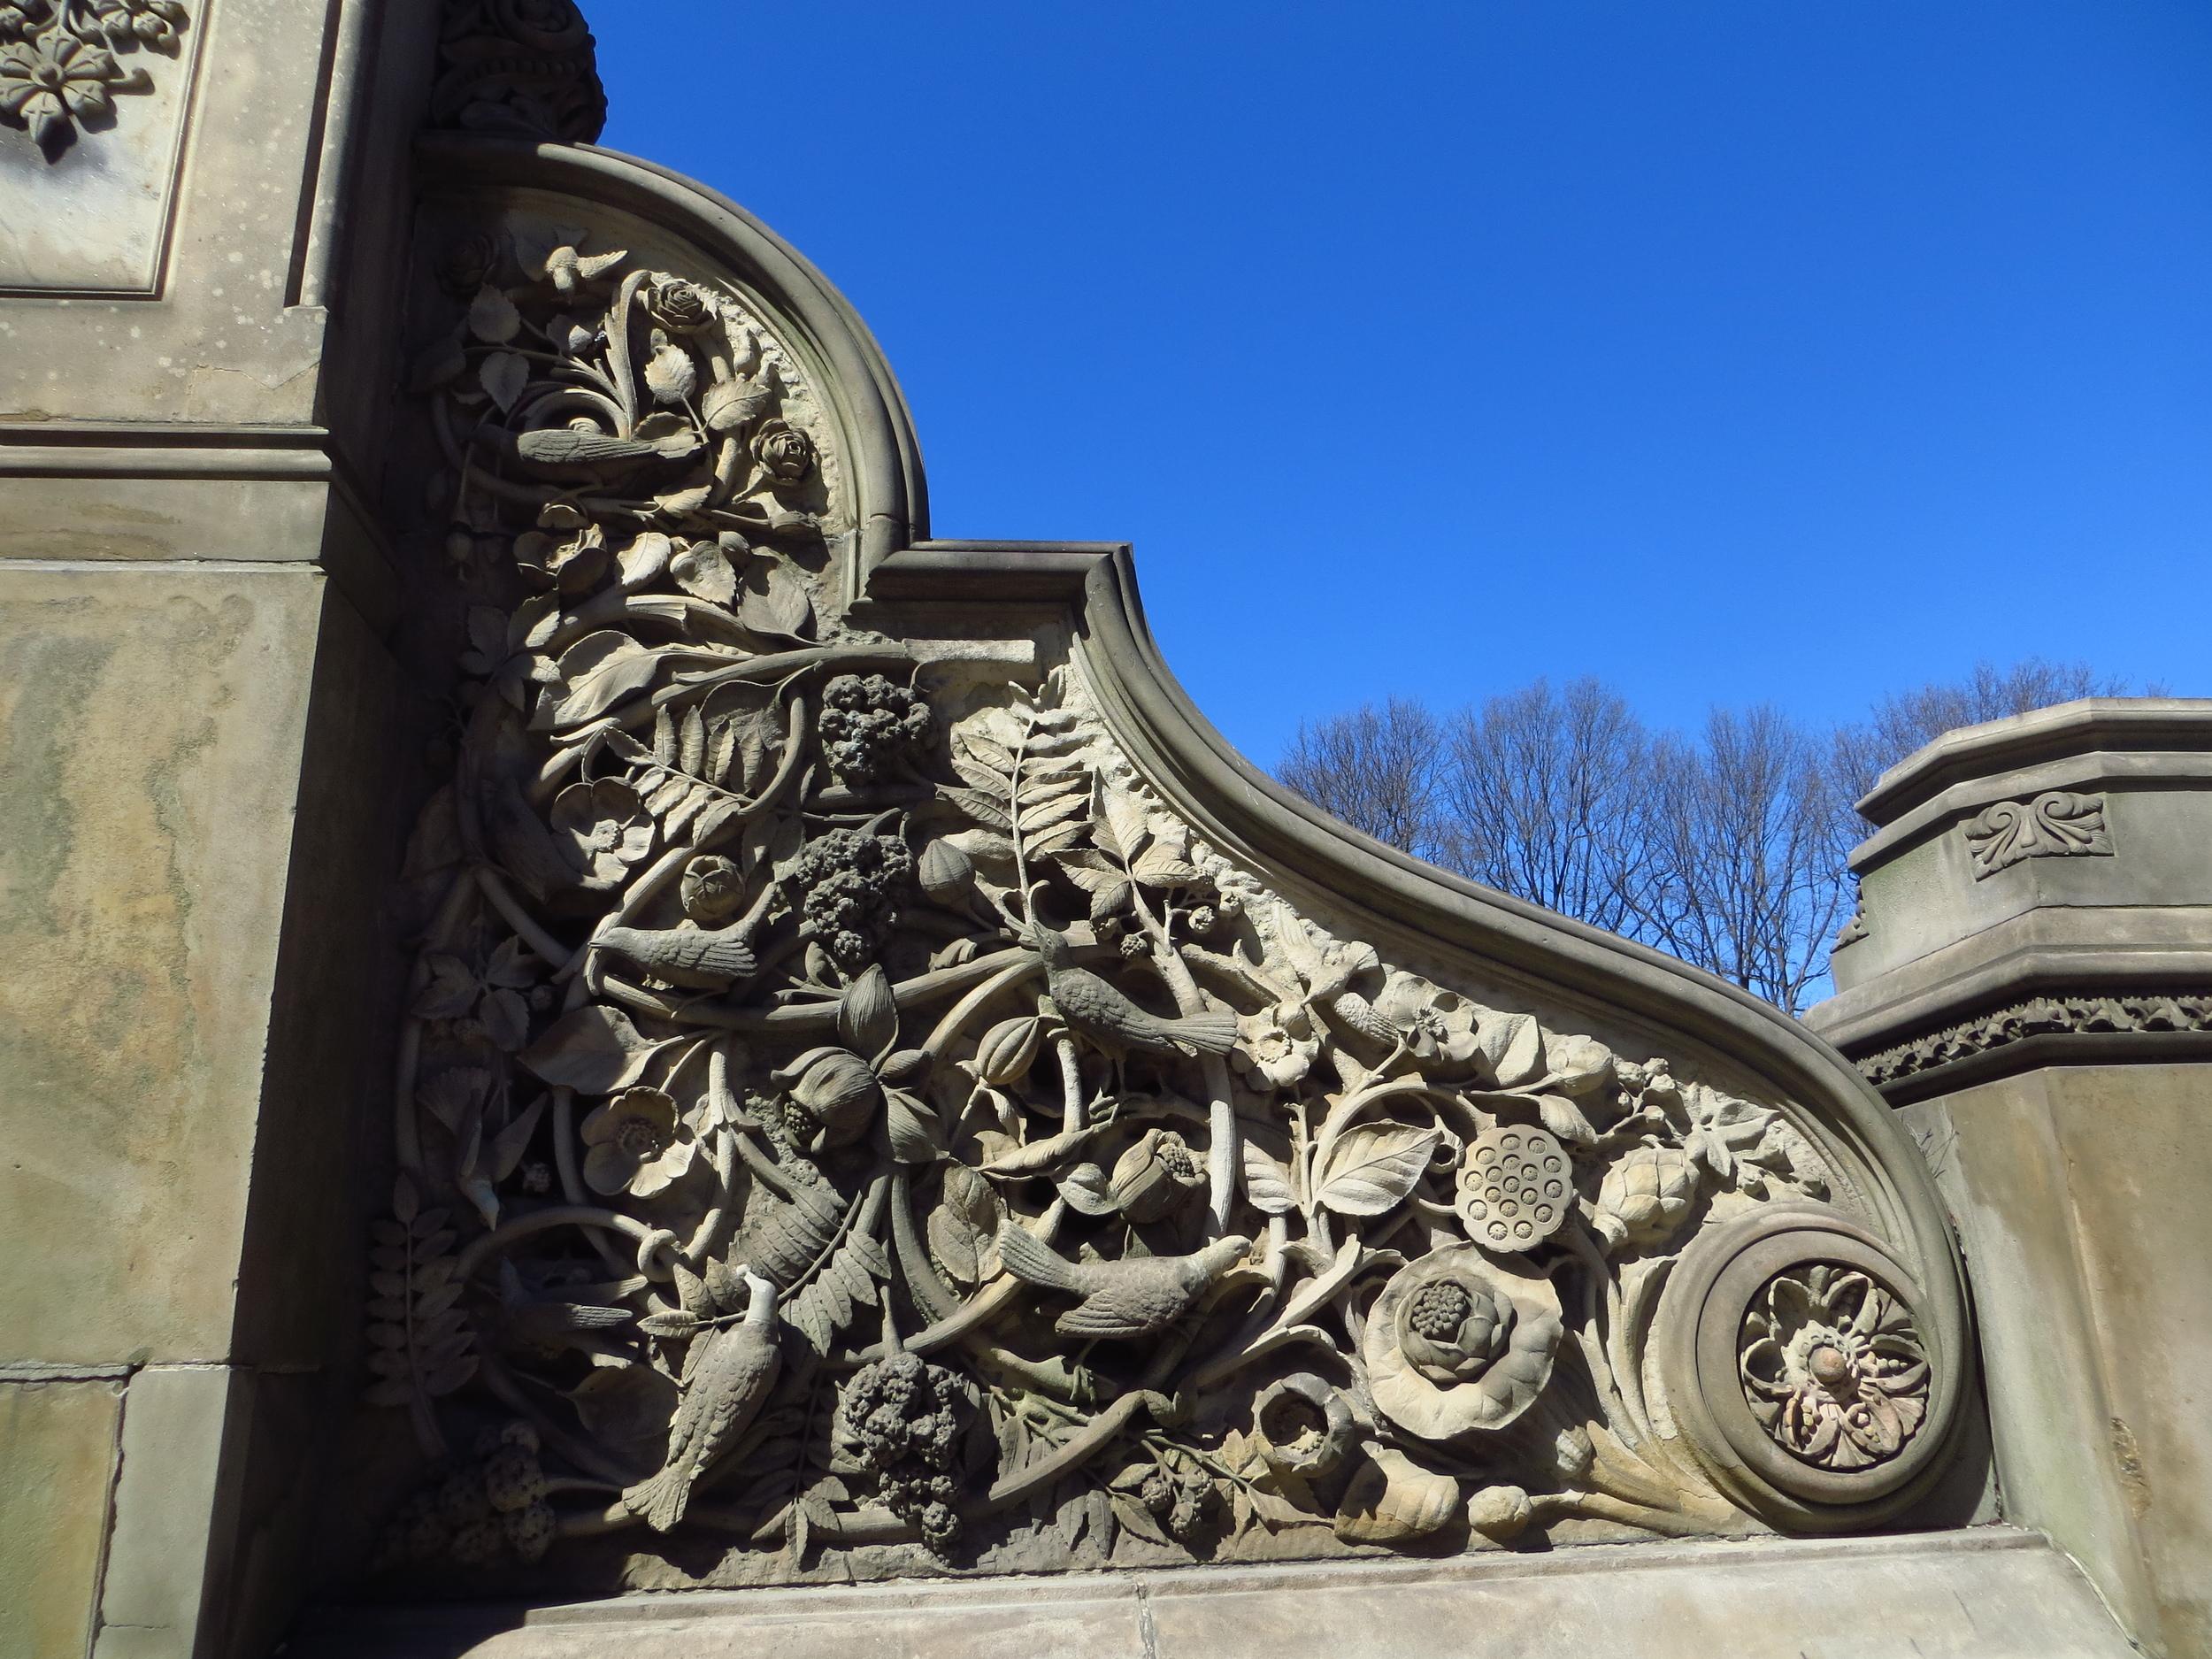 Bethesda Terrace stair detail